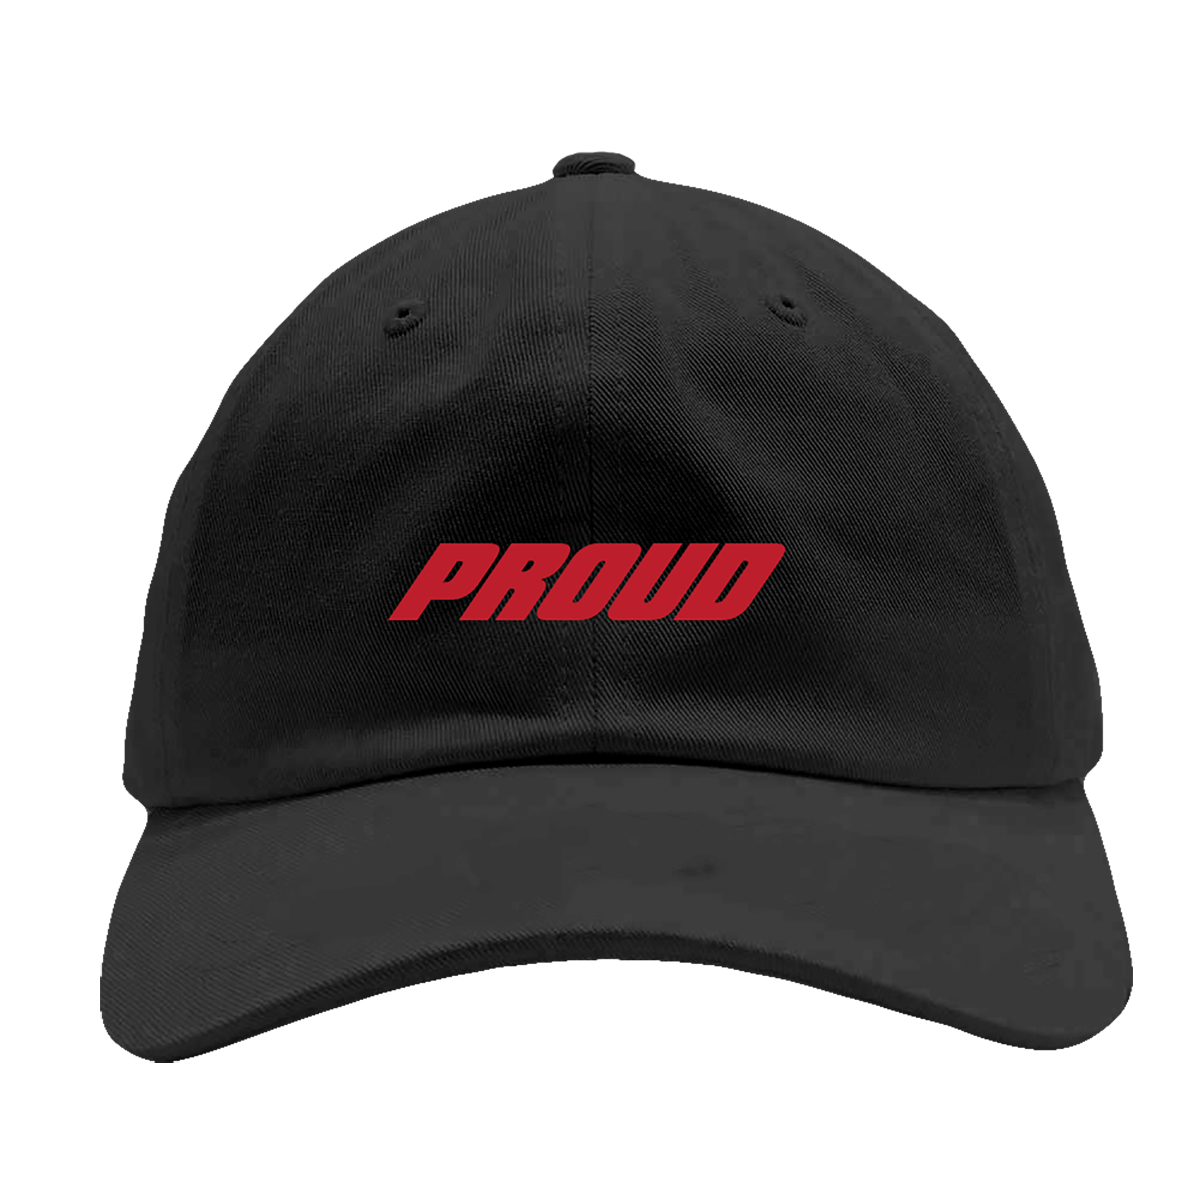 Proud Dad Hat